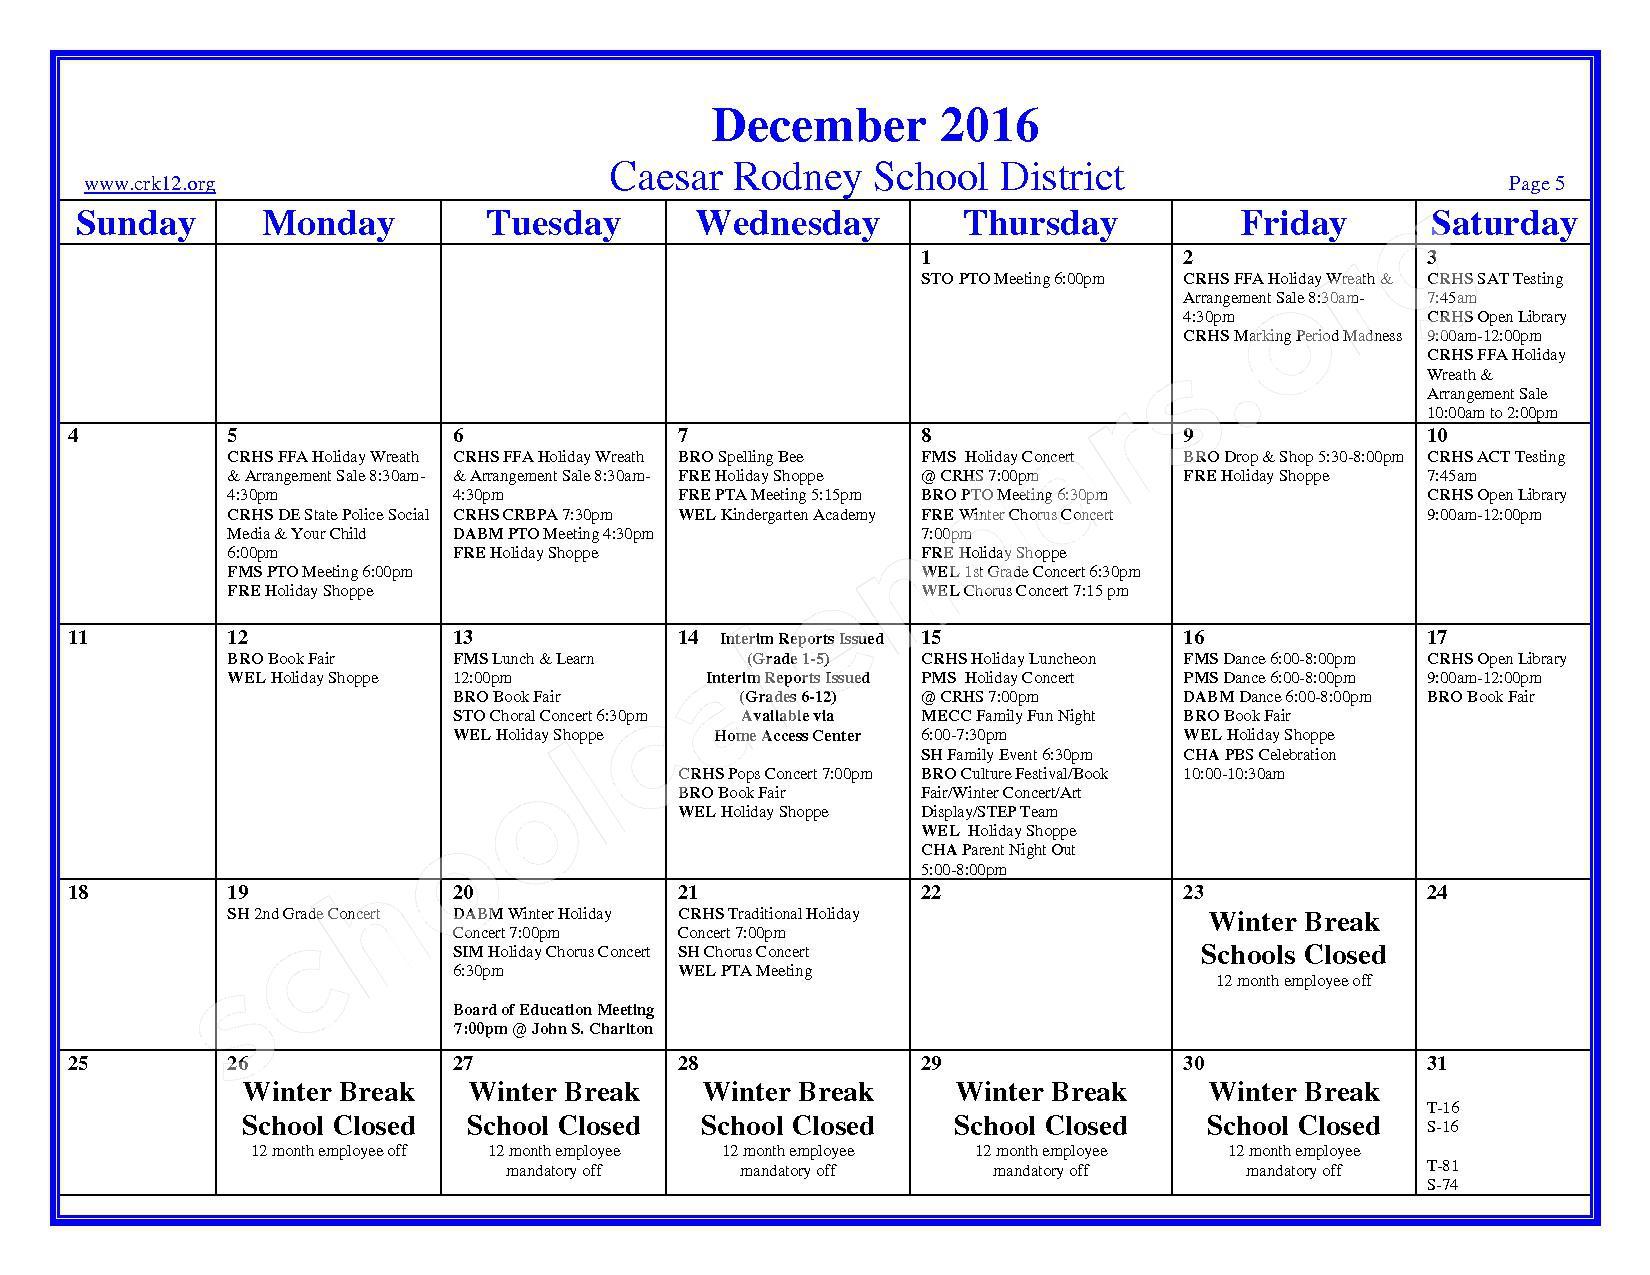 2016 - 2017 School Calendar – Brown (W. Reily) Elementary School – page 5